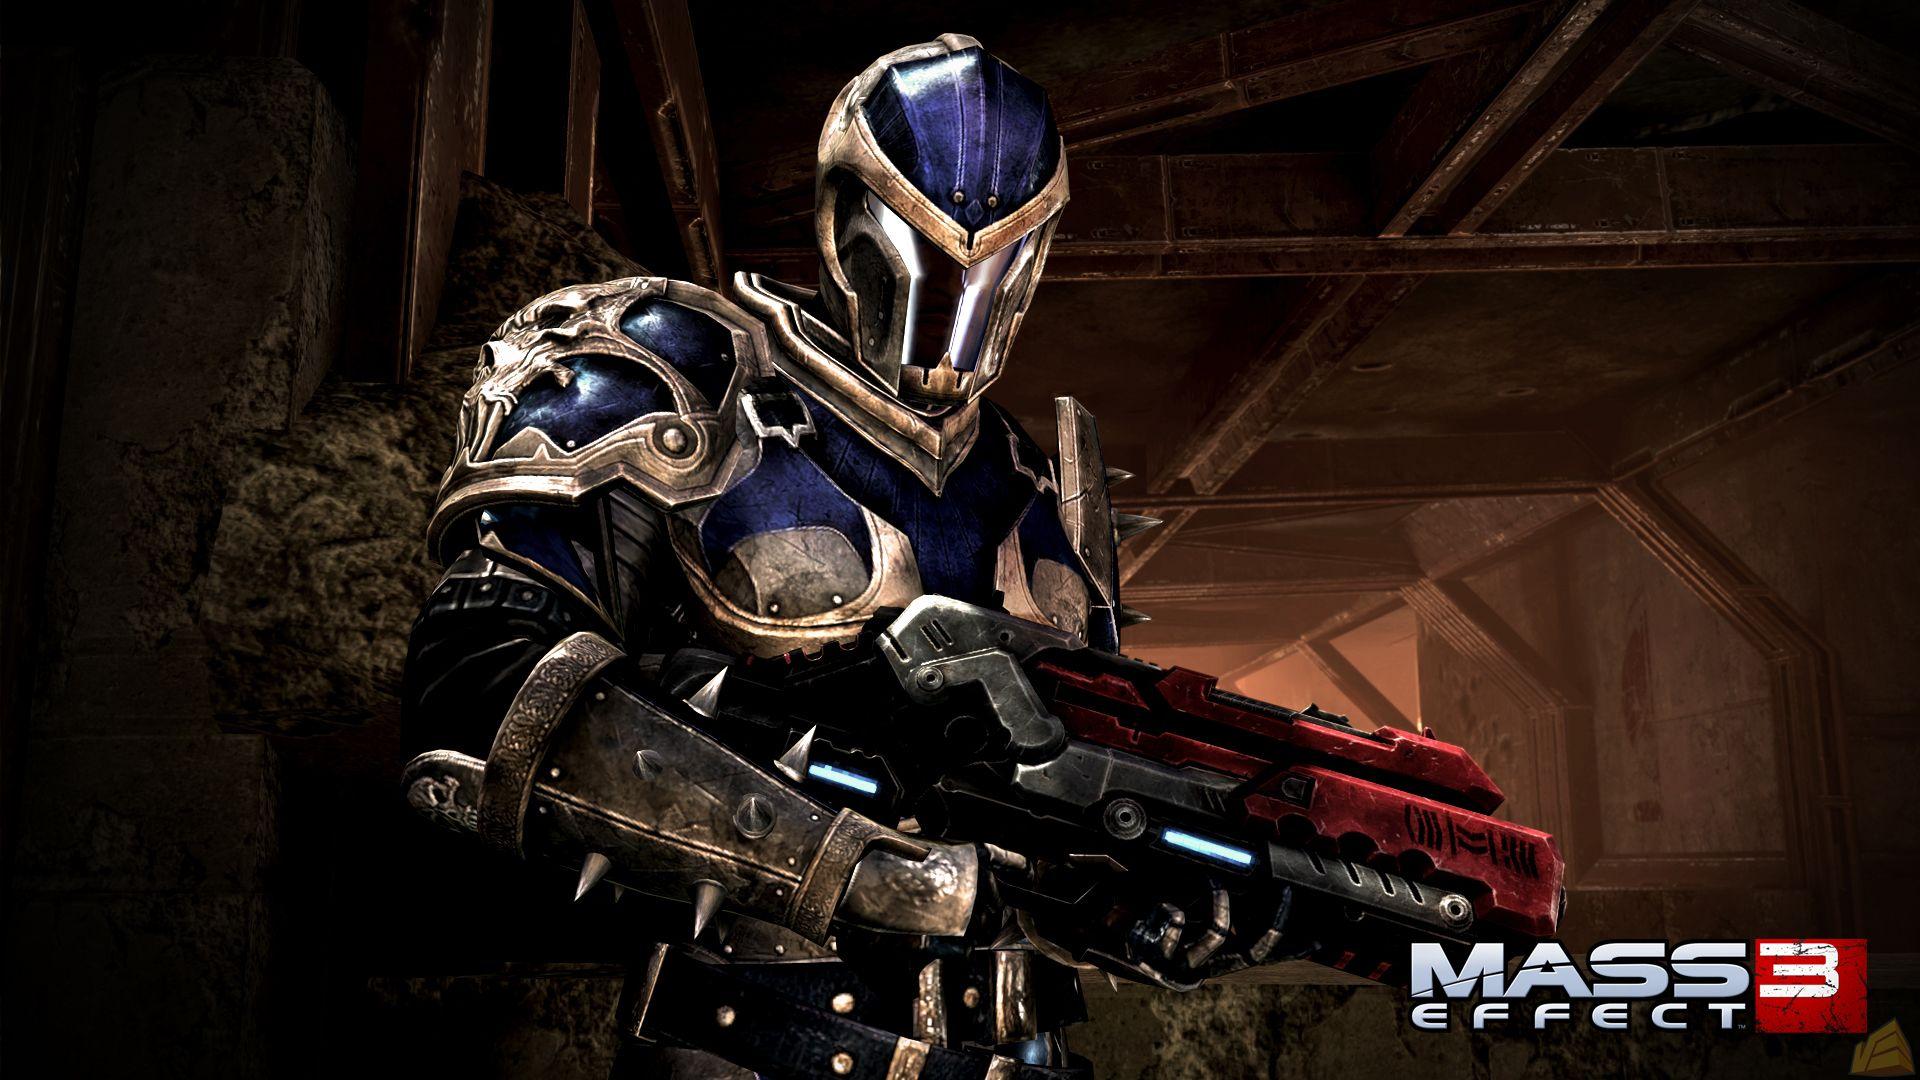 Mass Effect Mobile Wallpaper HD Desktop Wallpapers 4k HD